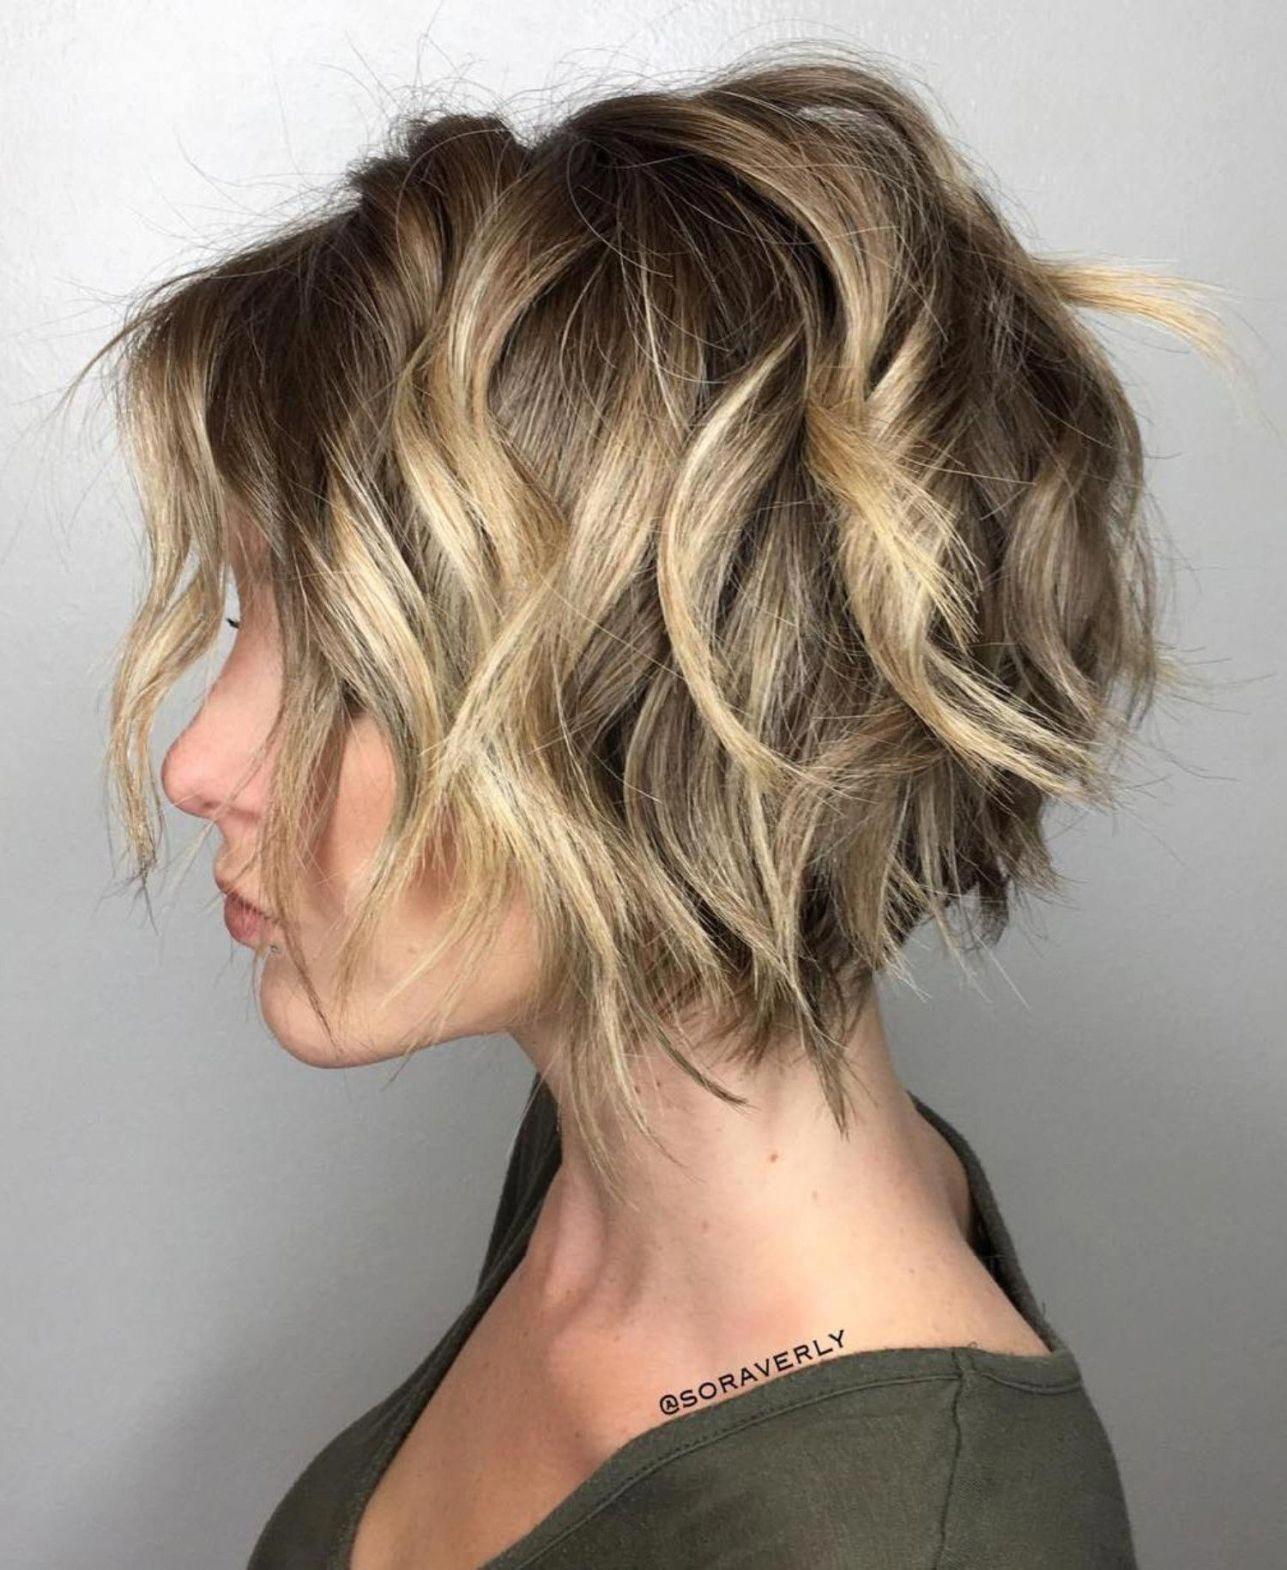 Short Fall hairstyles